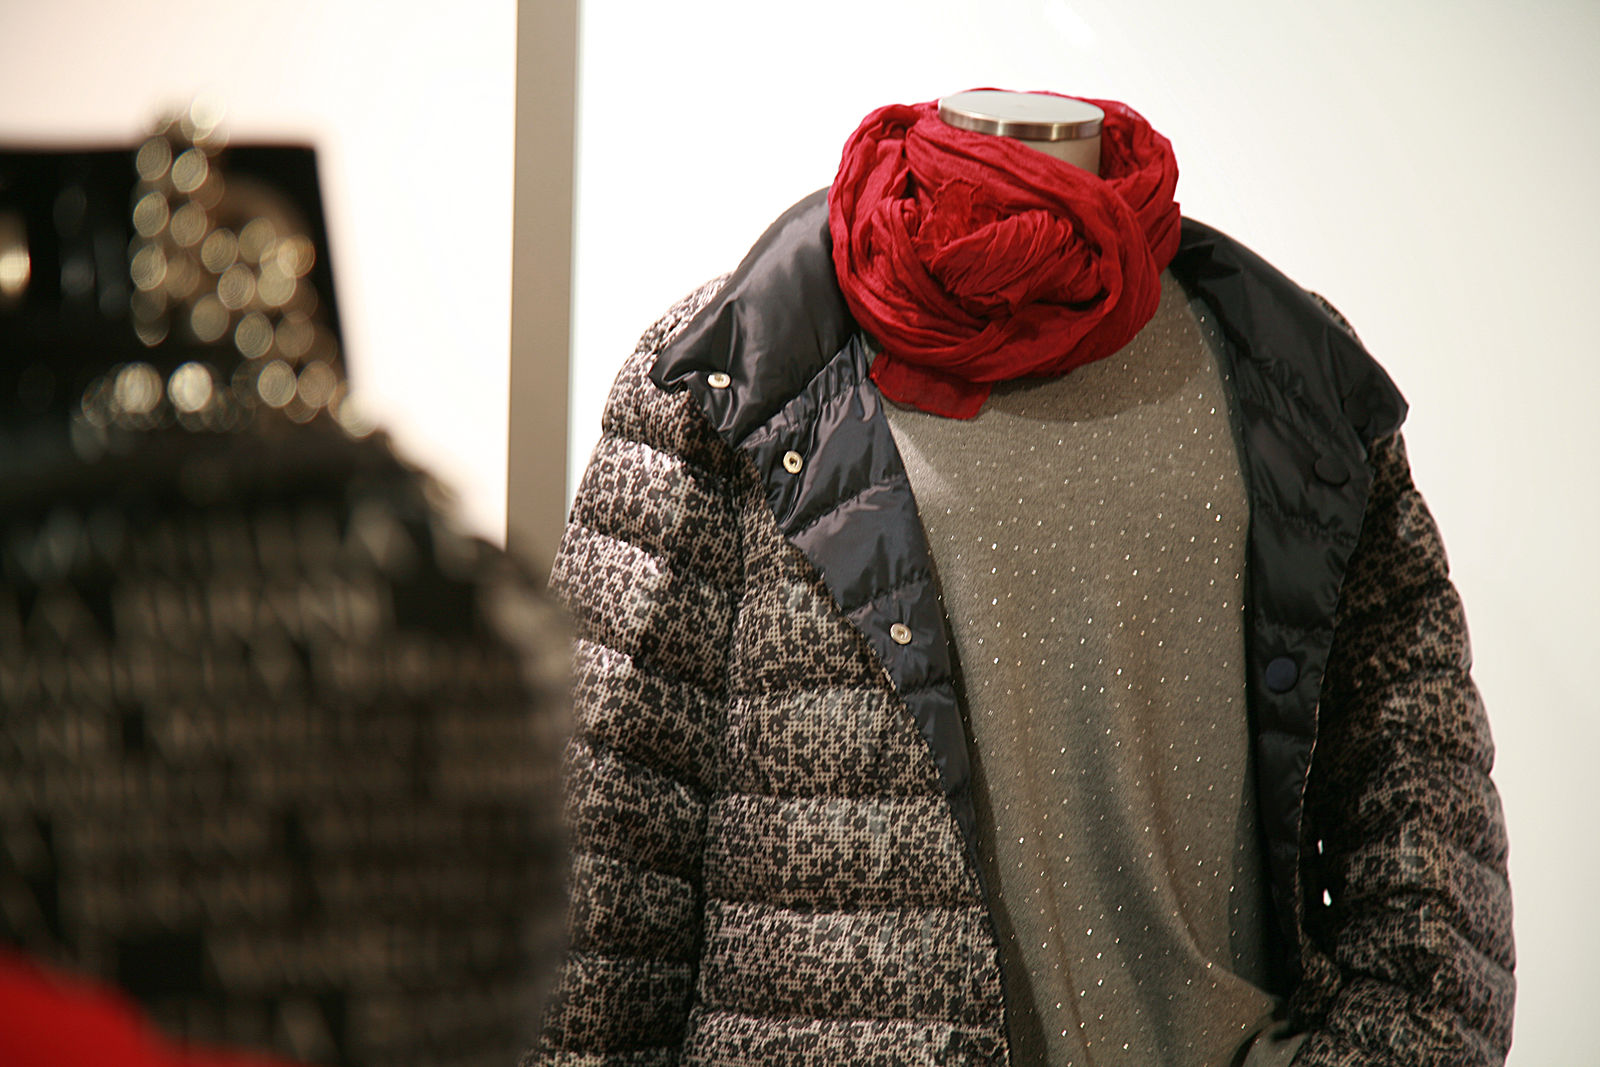 Heidis Mode - grosse Grössen in St. Gallen (Bild 2)